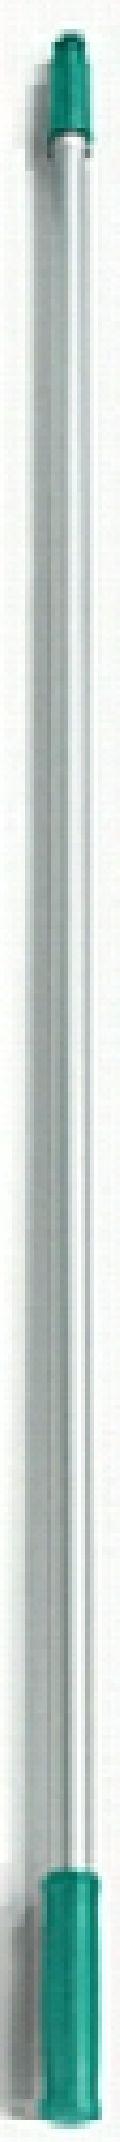 Fixed Poles Mops